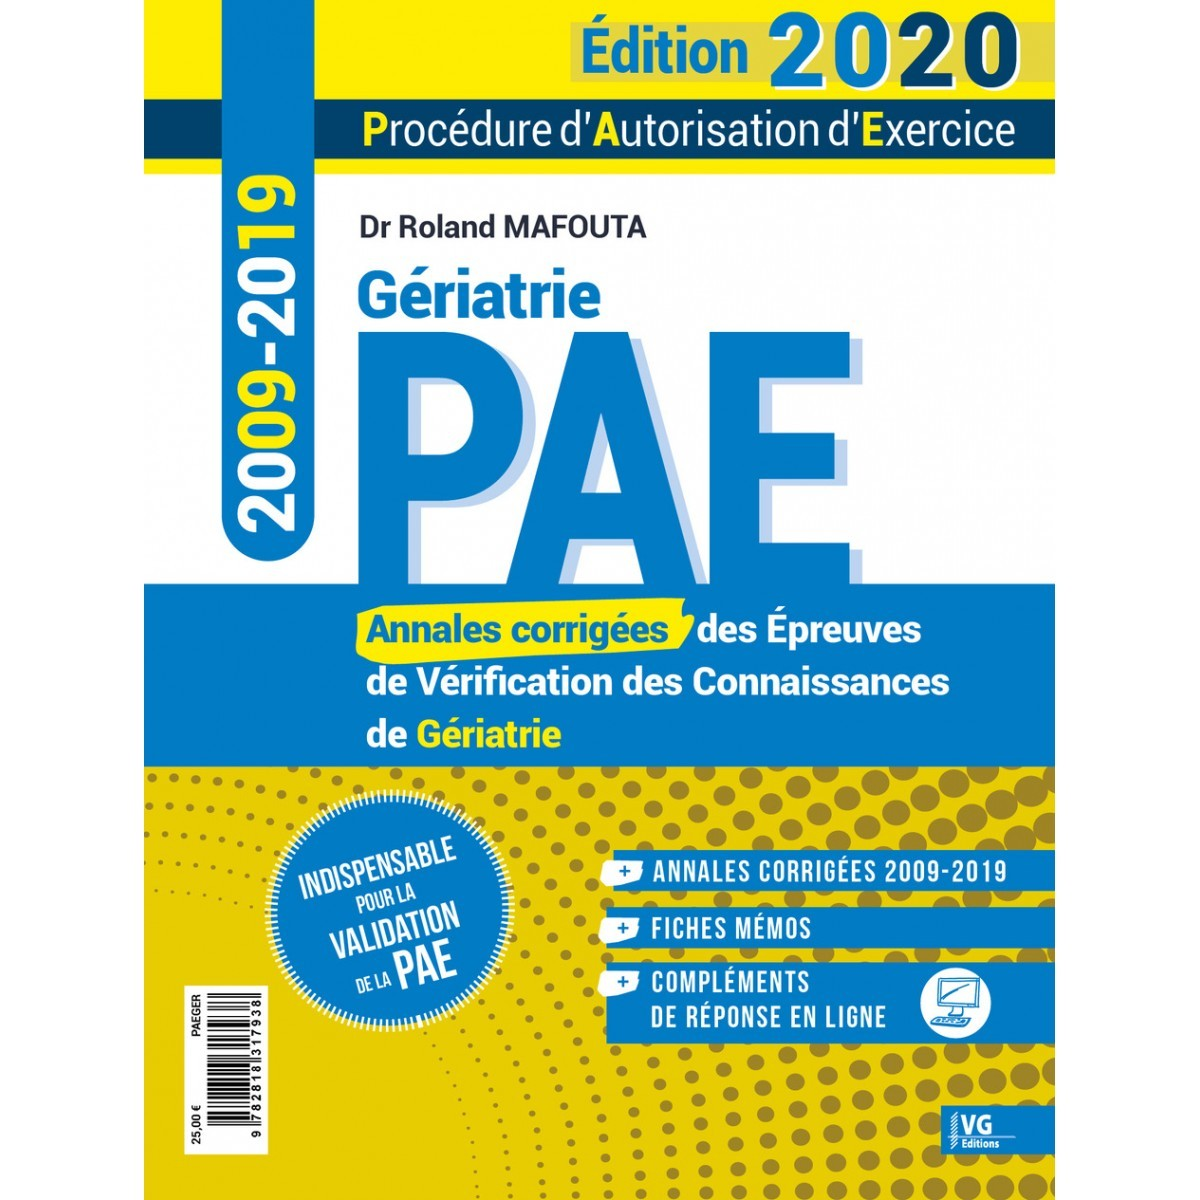 Annales de gériatrie 2009-2019 PAE